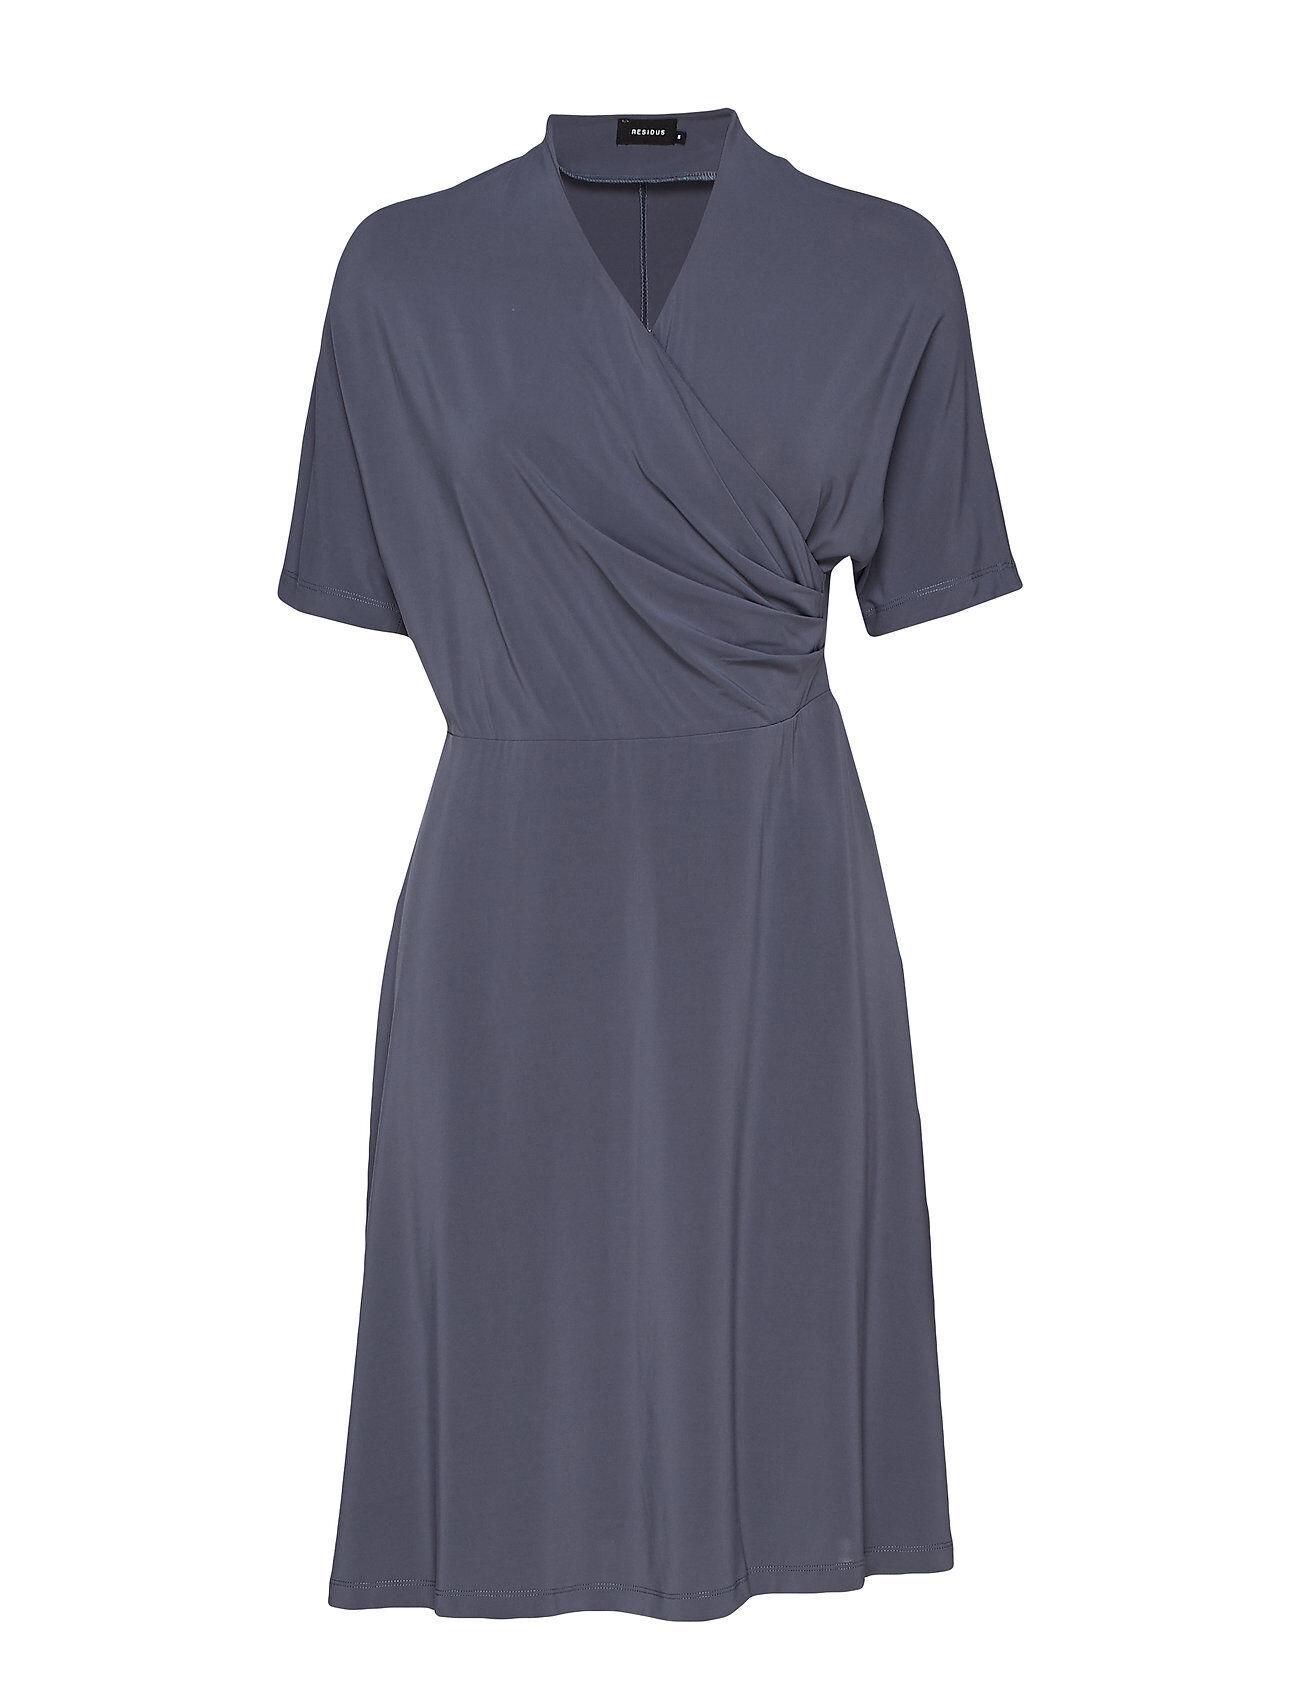 Residus Pomme Dress Polvipituinen Mekko Sininen Residus